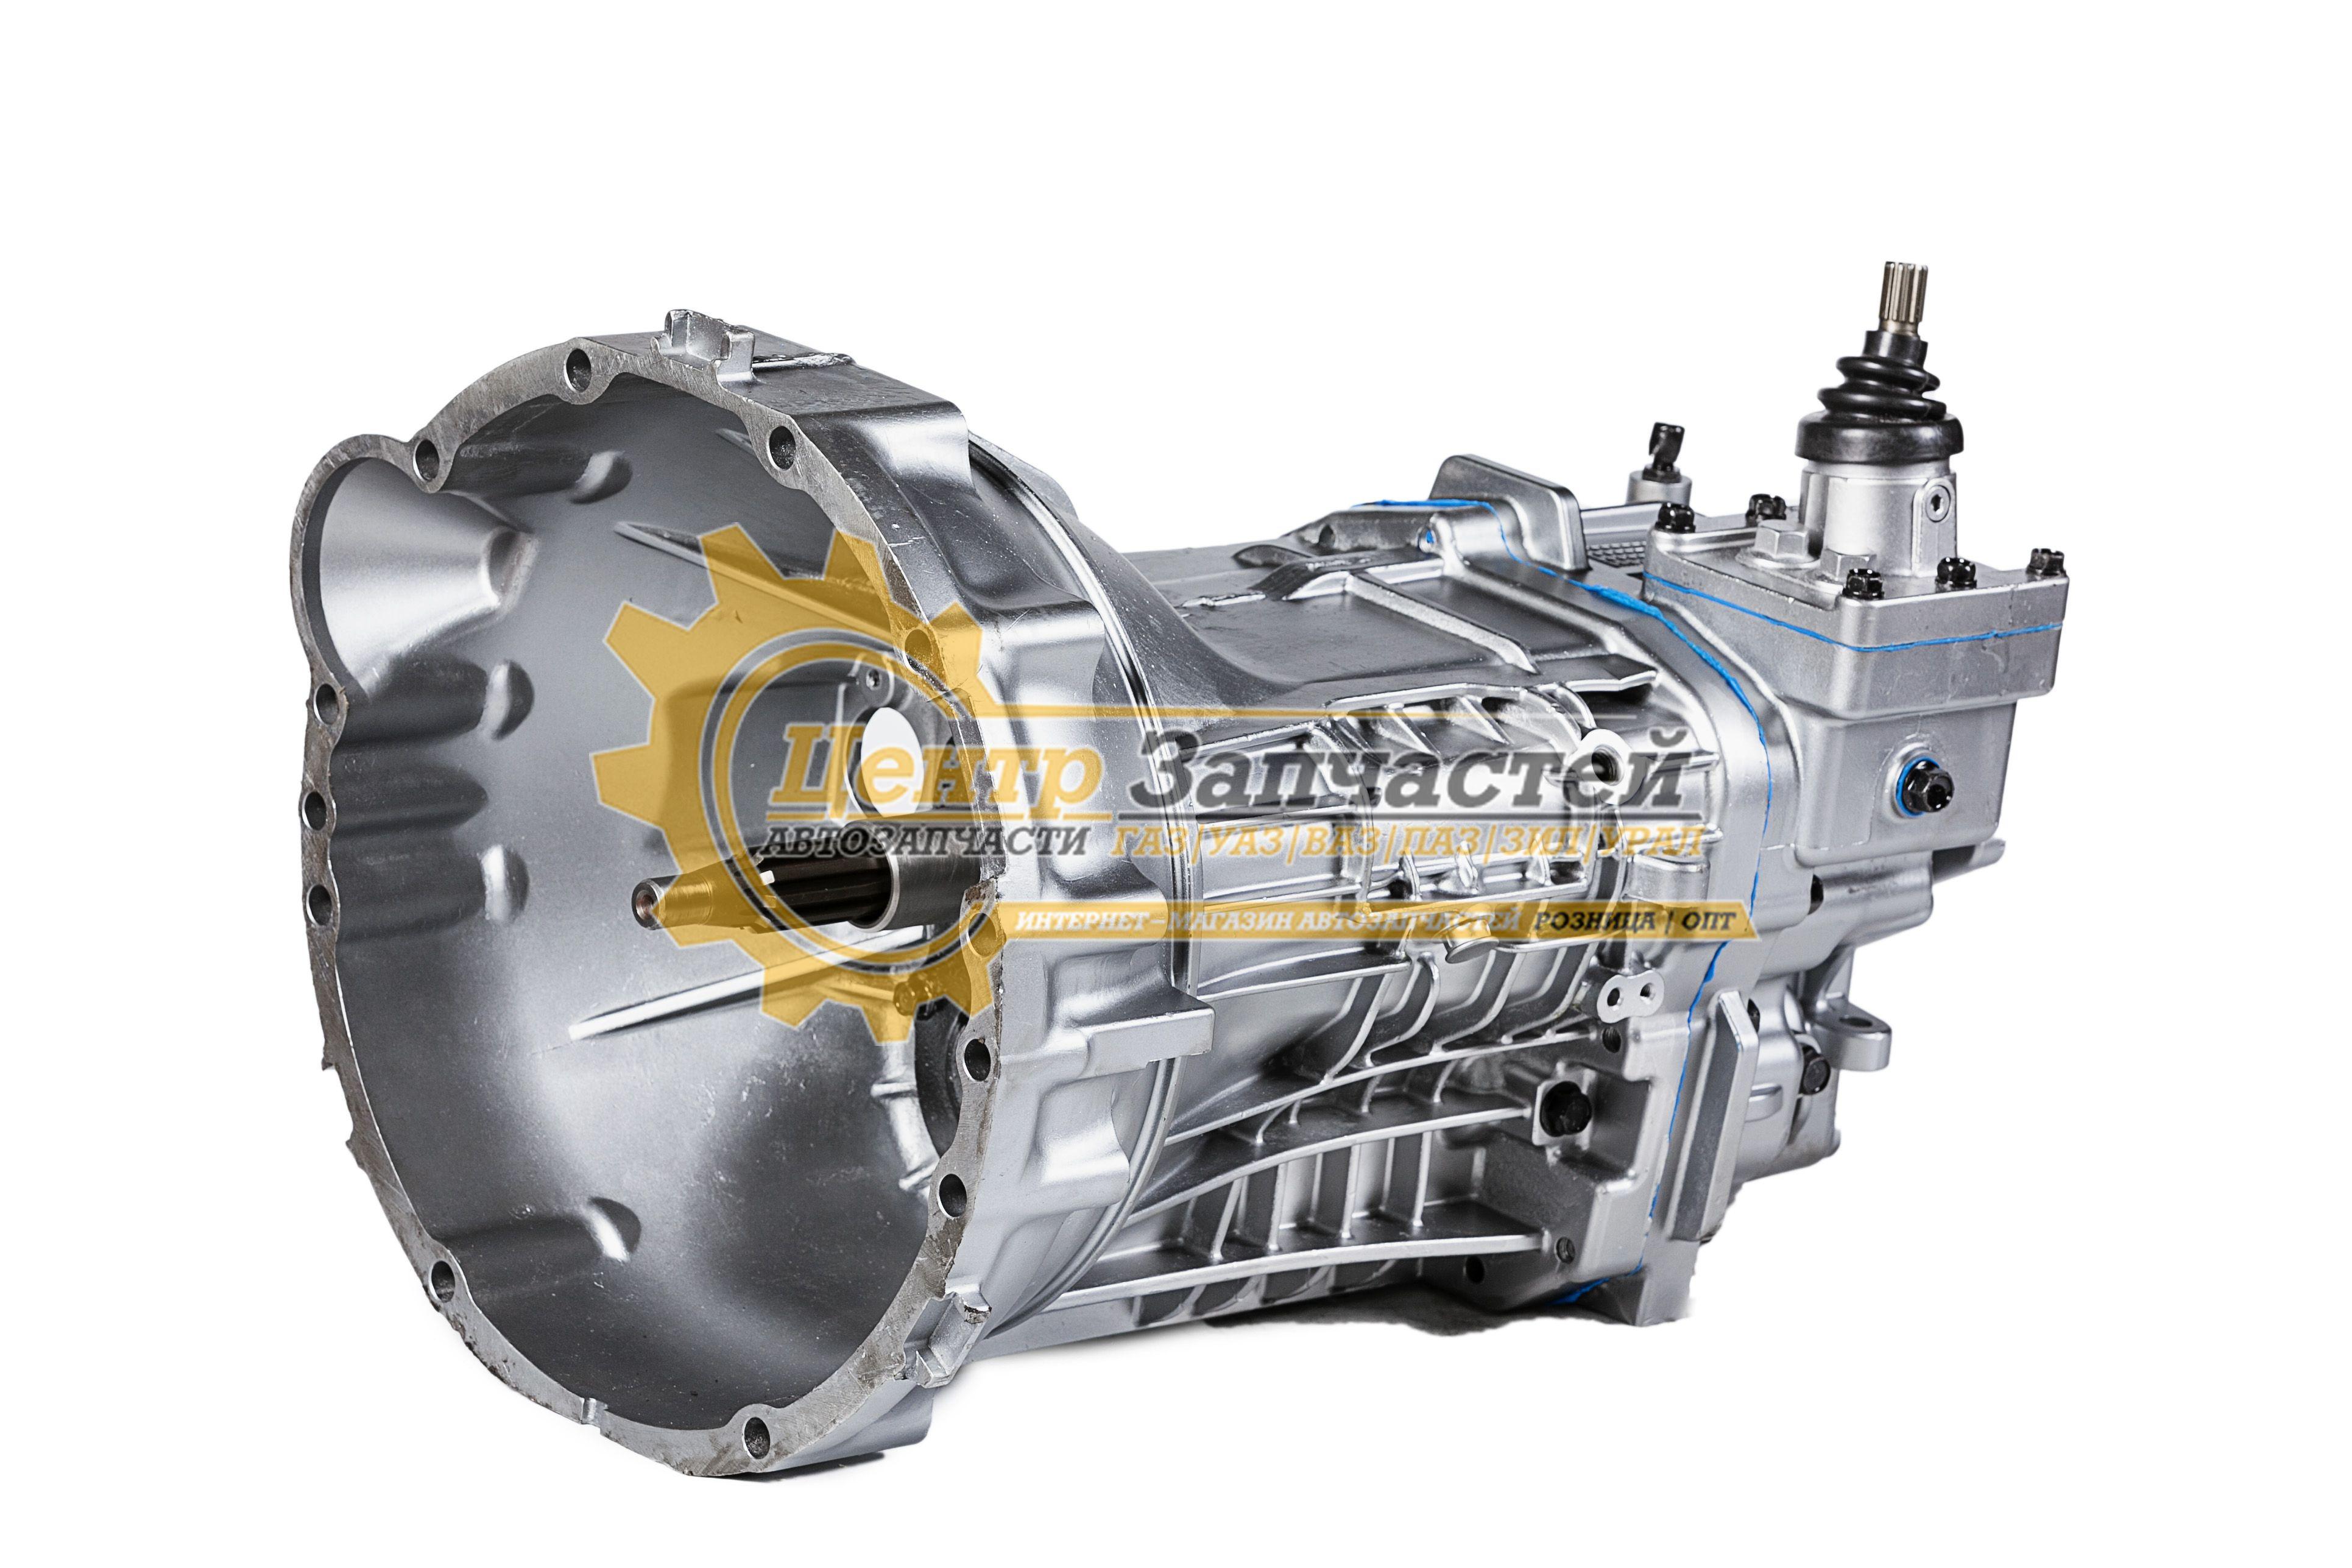 Коробка передач УАЗ (DYMOS) патриот двигатель ЗМЗ-409.  Артикул 3163-1700010. 43000т20150